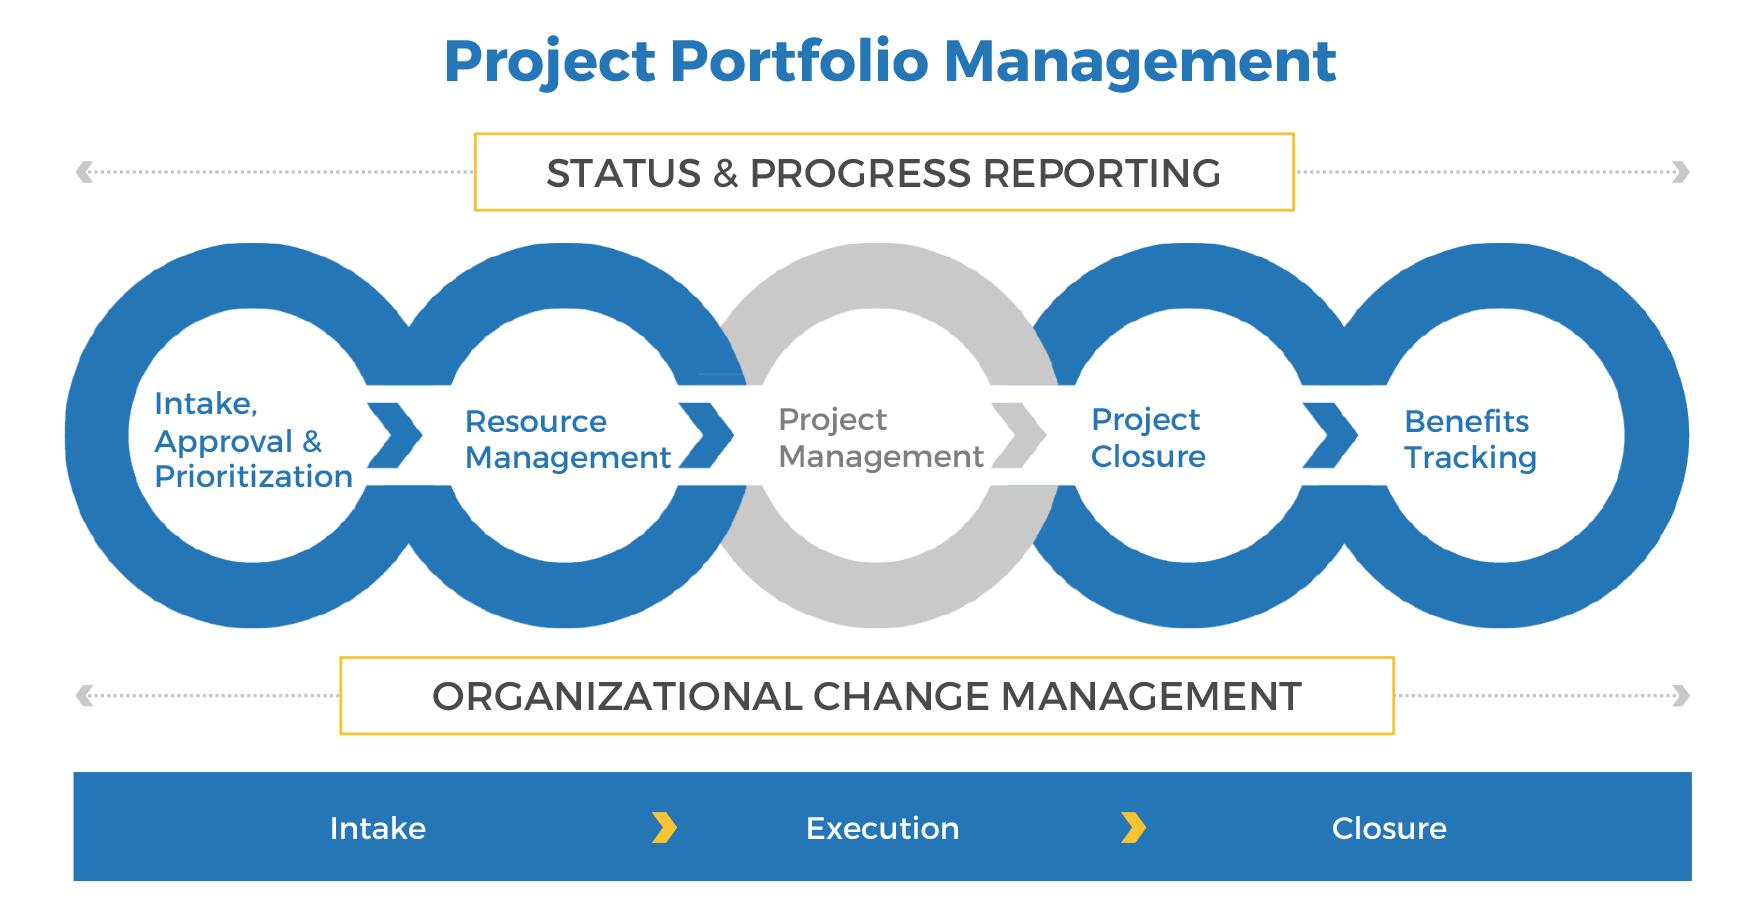 Projectportfoliothroughputassessmentthoughtmodel 062220